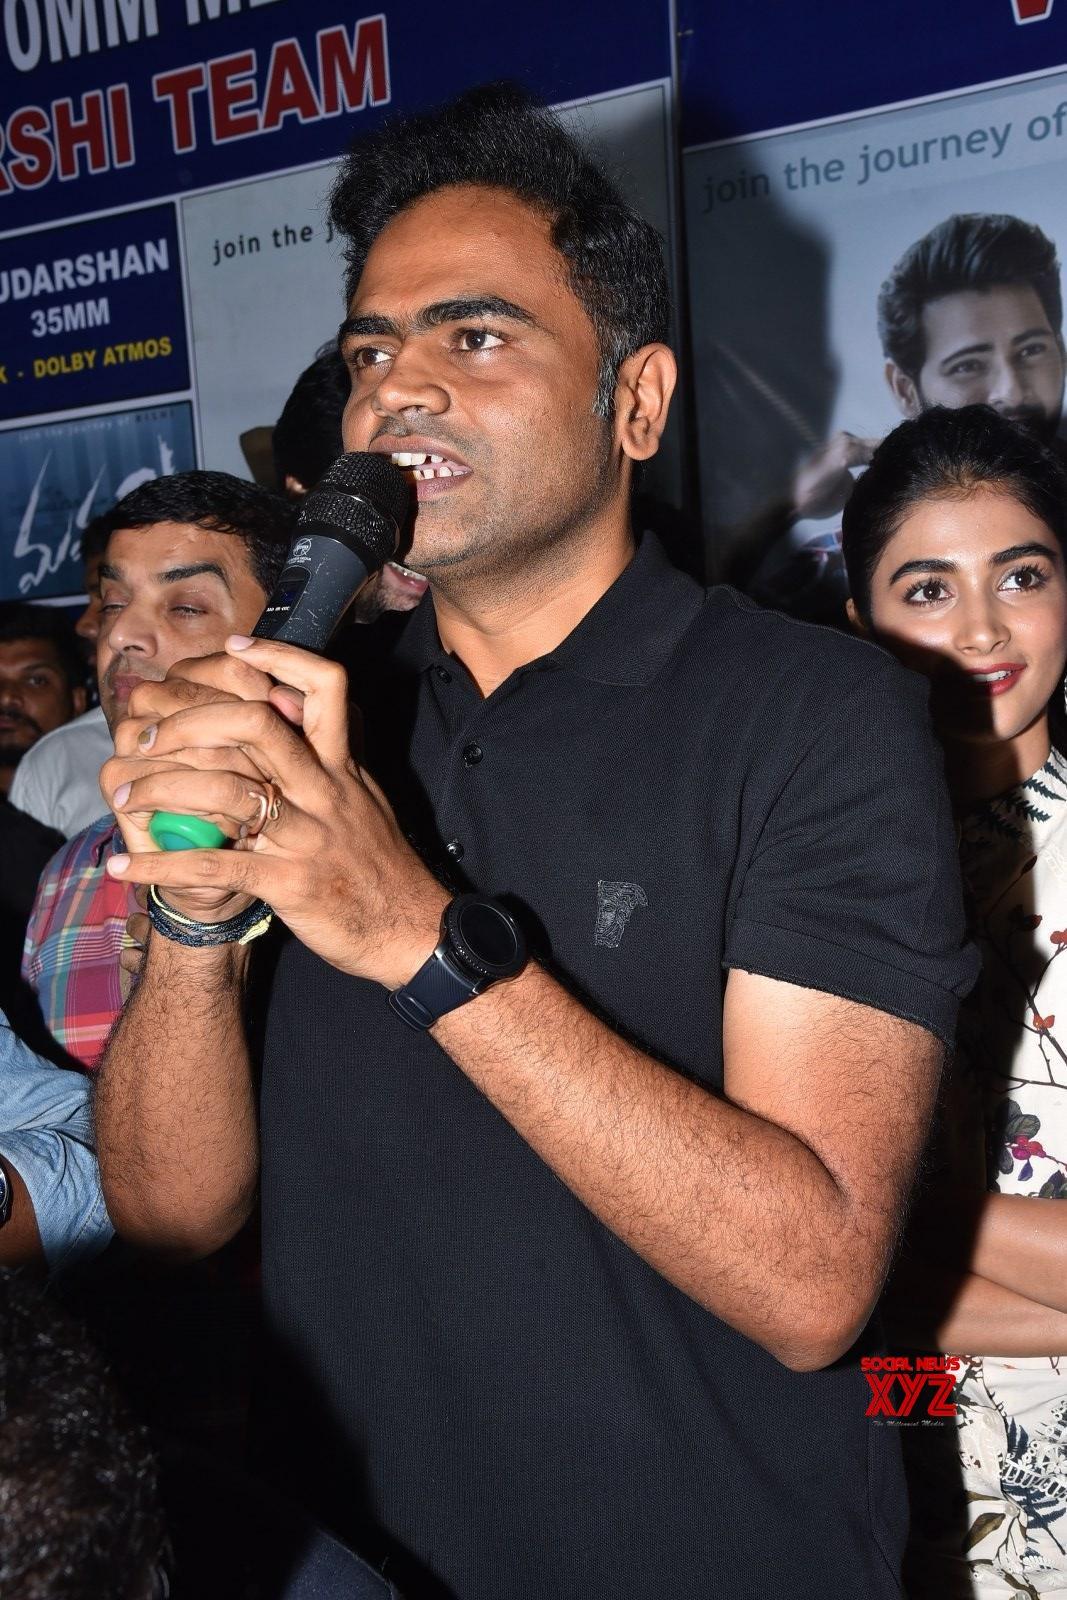 Mahesh Babu Visits To Sudarshan 35 MM With Maharshi Movie Team Gallery Set 3